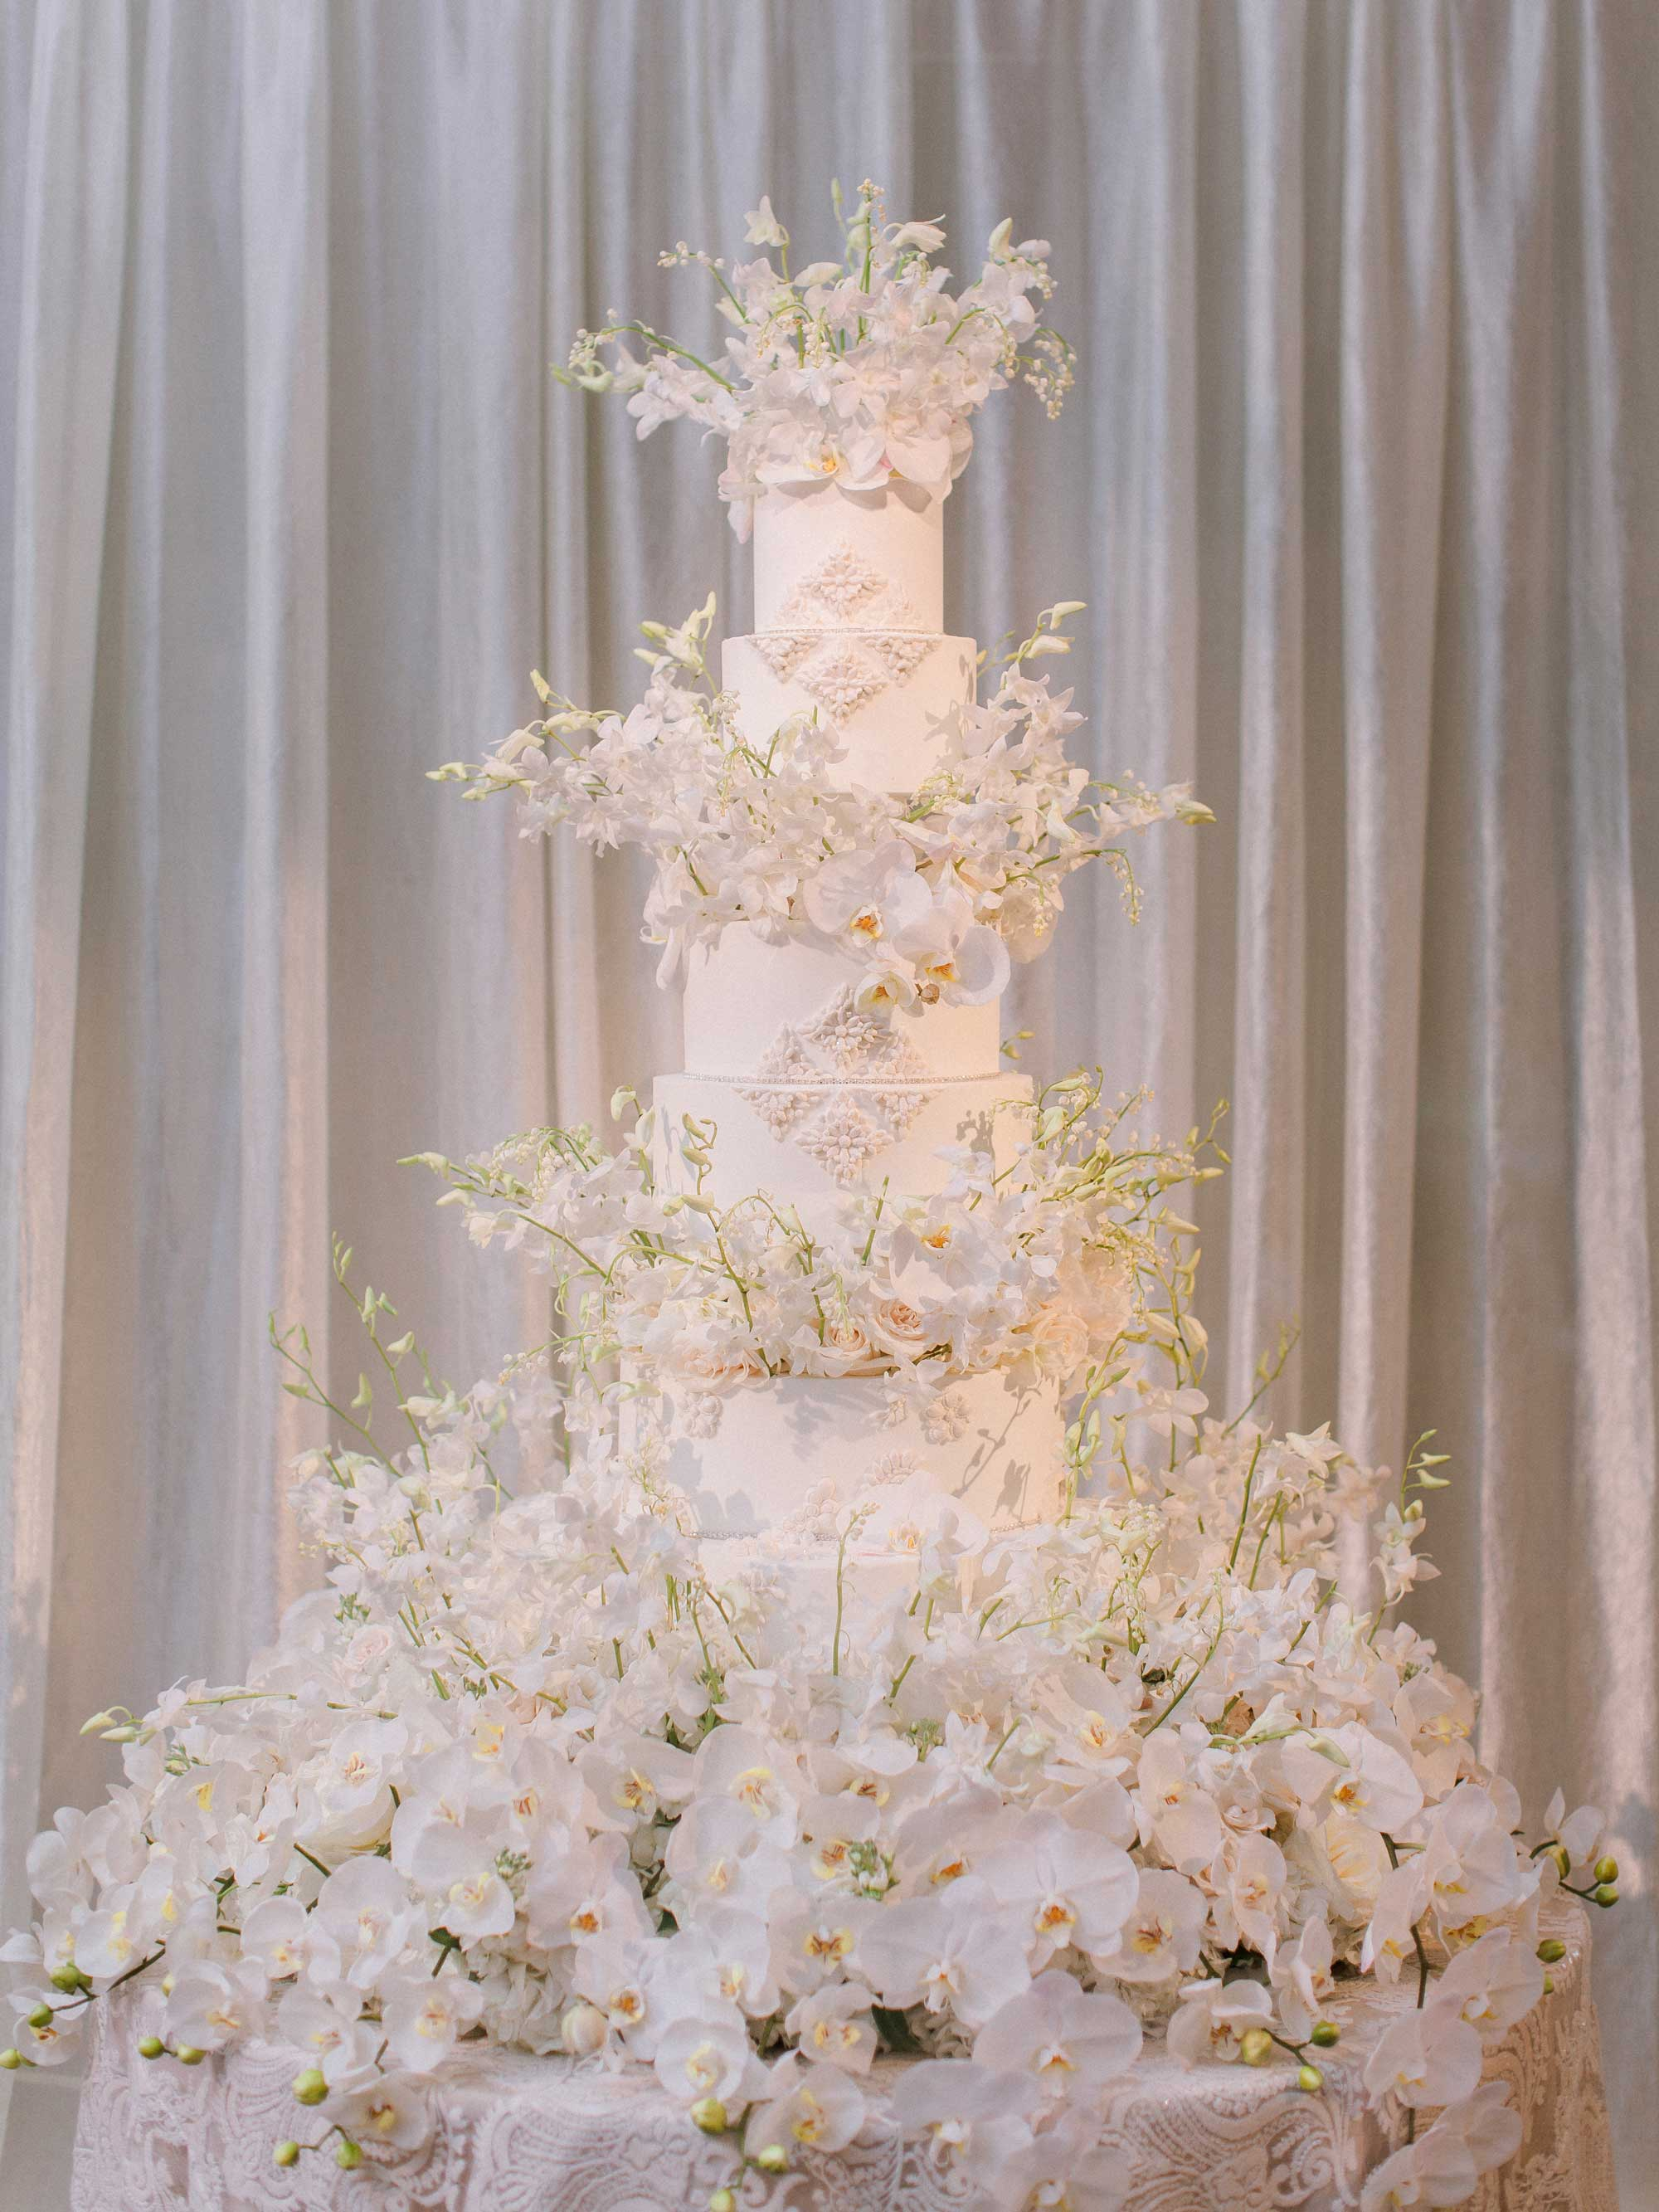 Inside Weddings Spring 2017 issue beautiful white cake with fresh flower decorations wedding reception in Dallas Bella Flora of Dallas